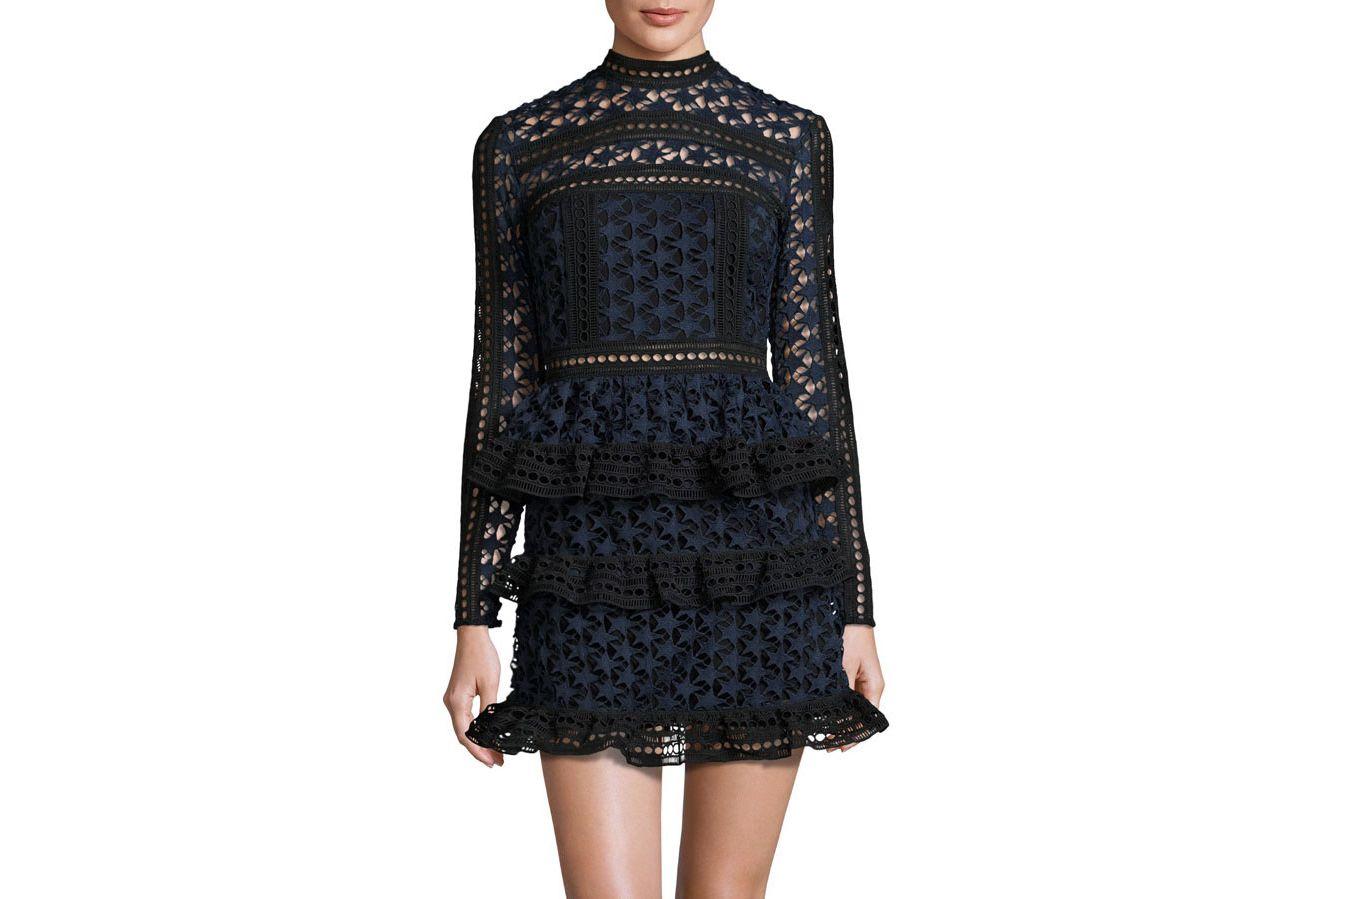 Self-Portrait High Neck Lace Panelled Dress